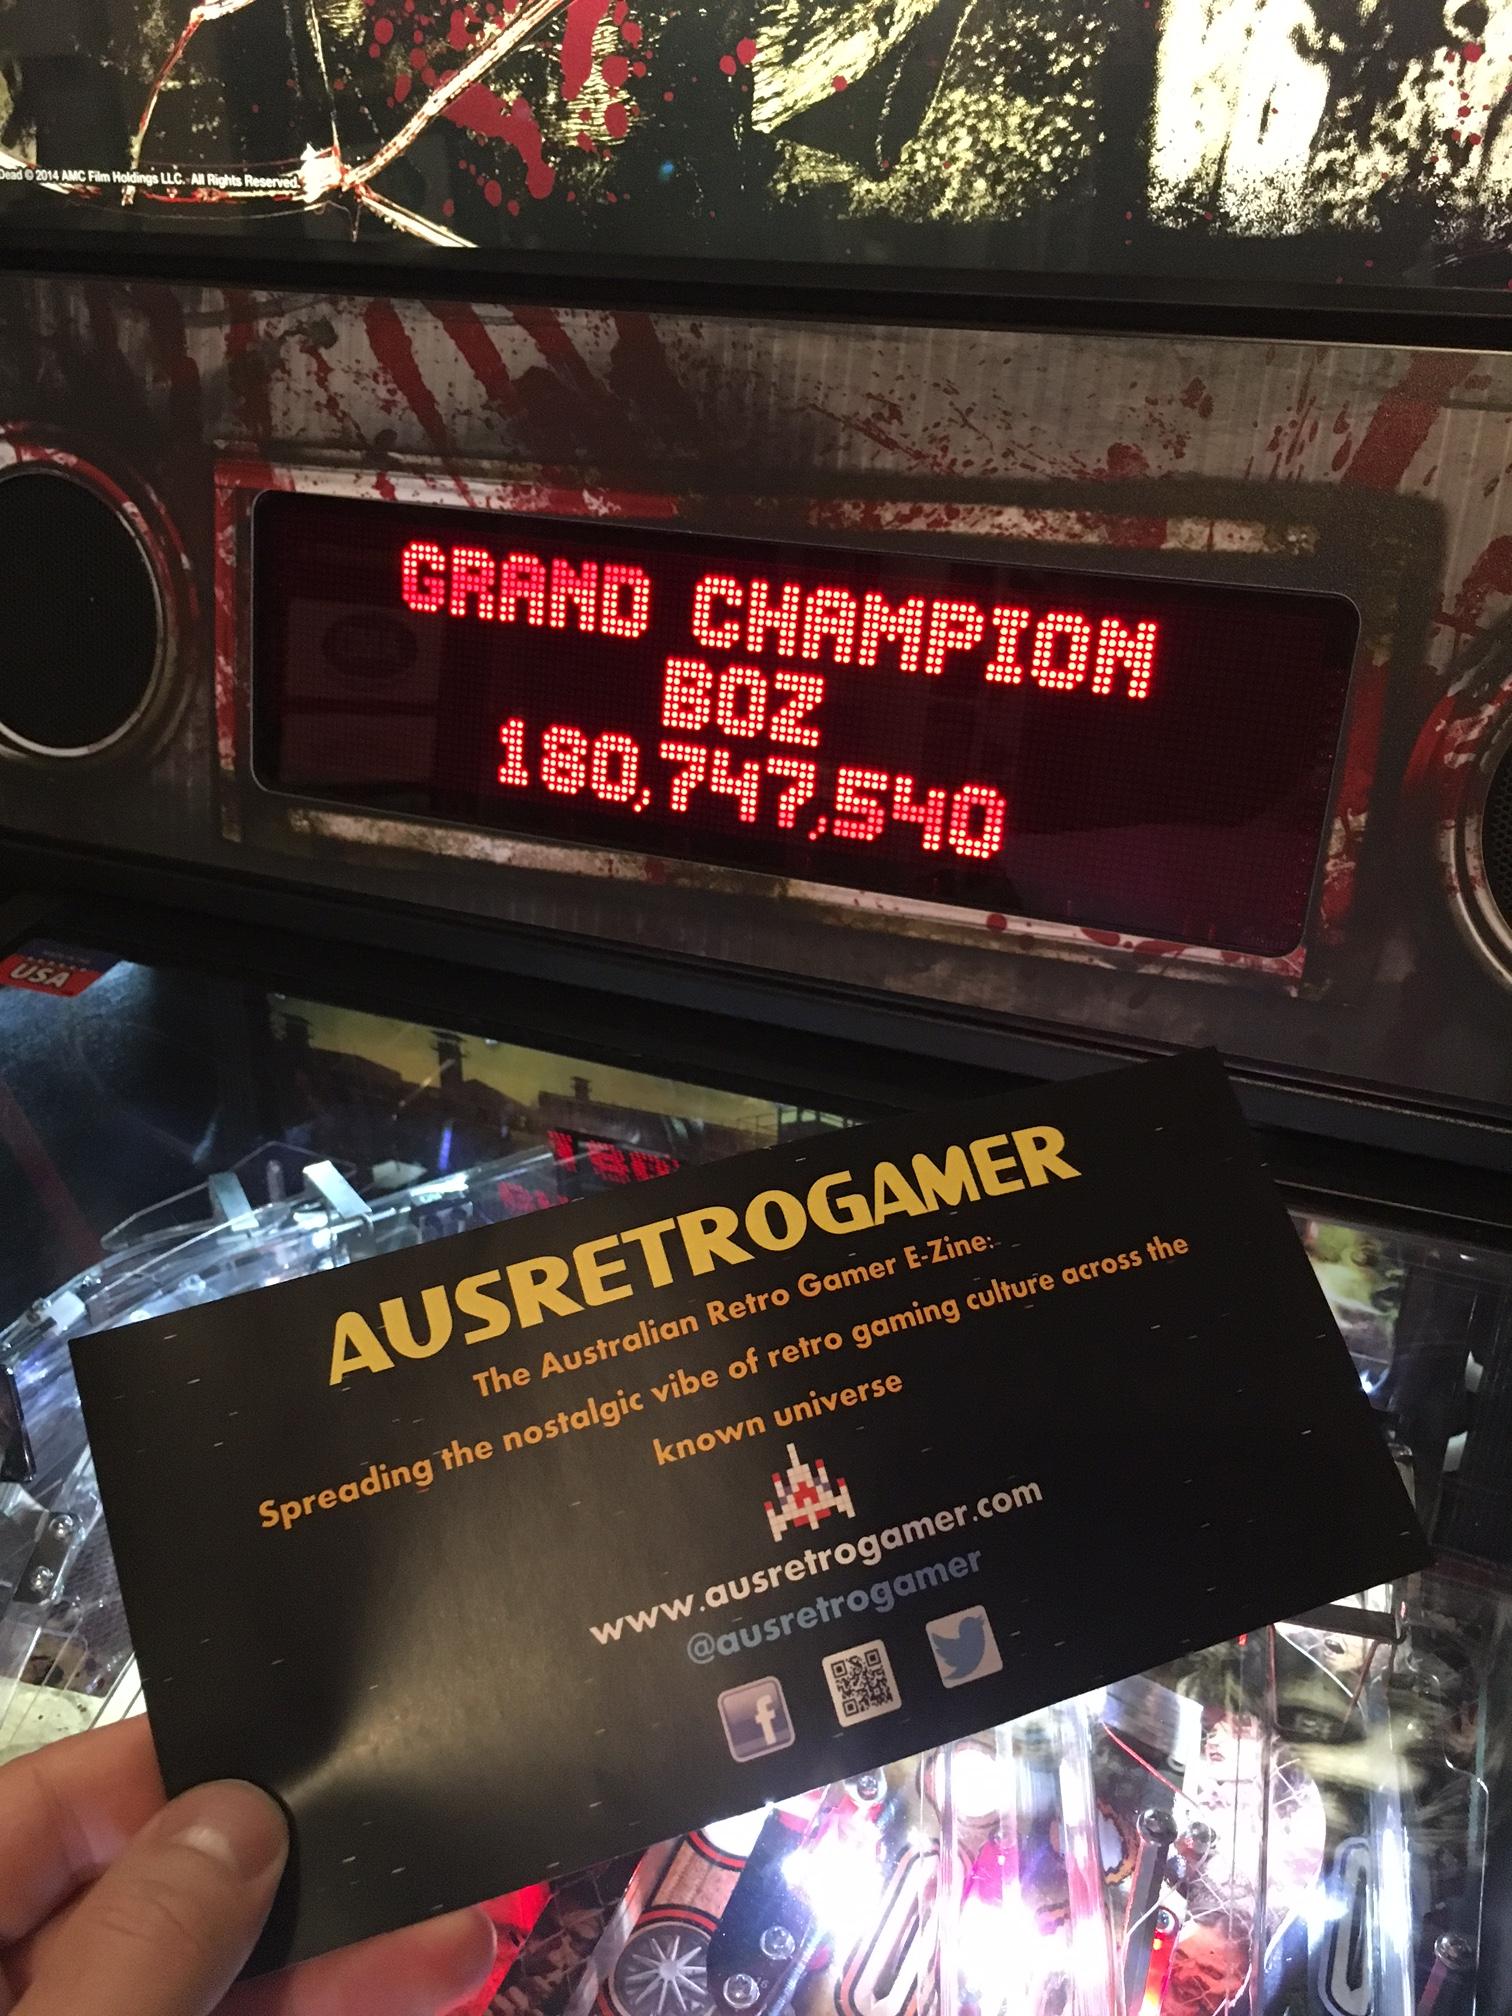 ausretrogamer: The Walking Dead (Pinball: 3 Balls) 180,747,540 points on 2017-04-23 22:18:48